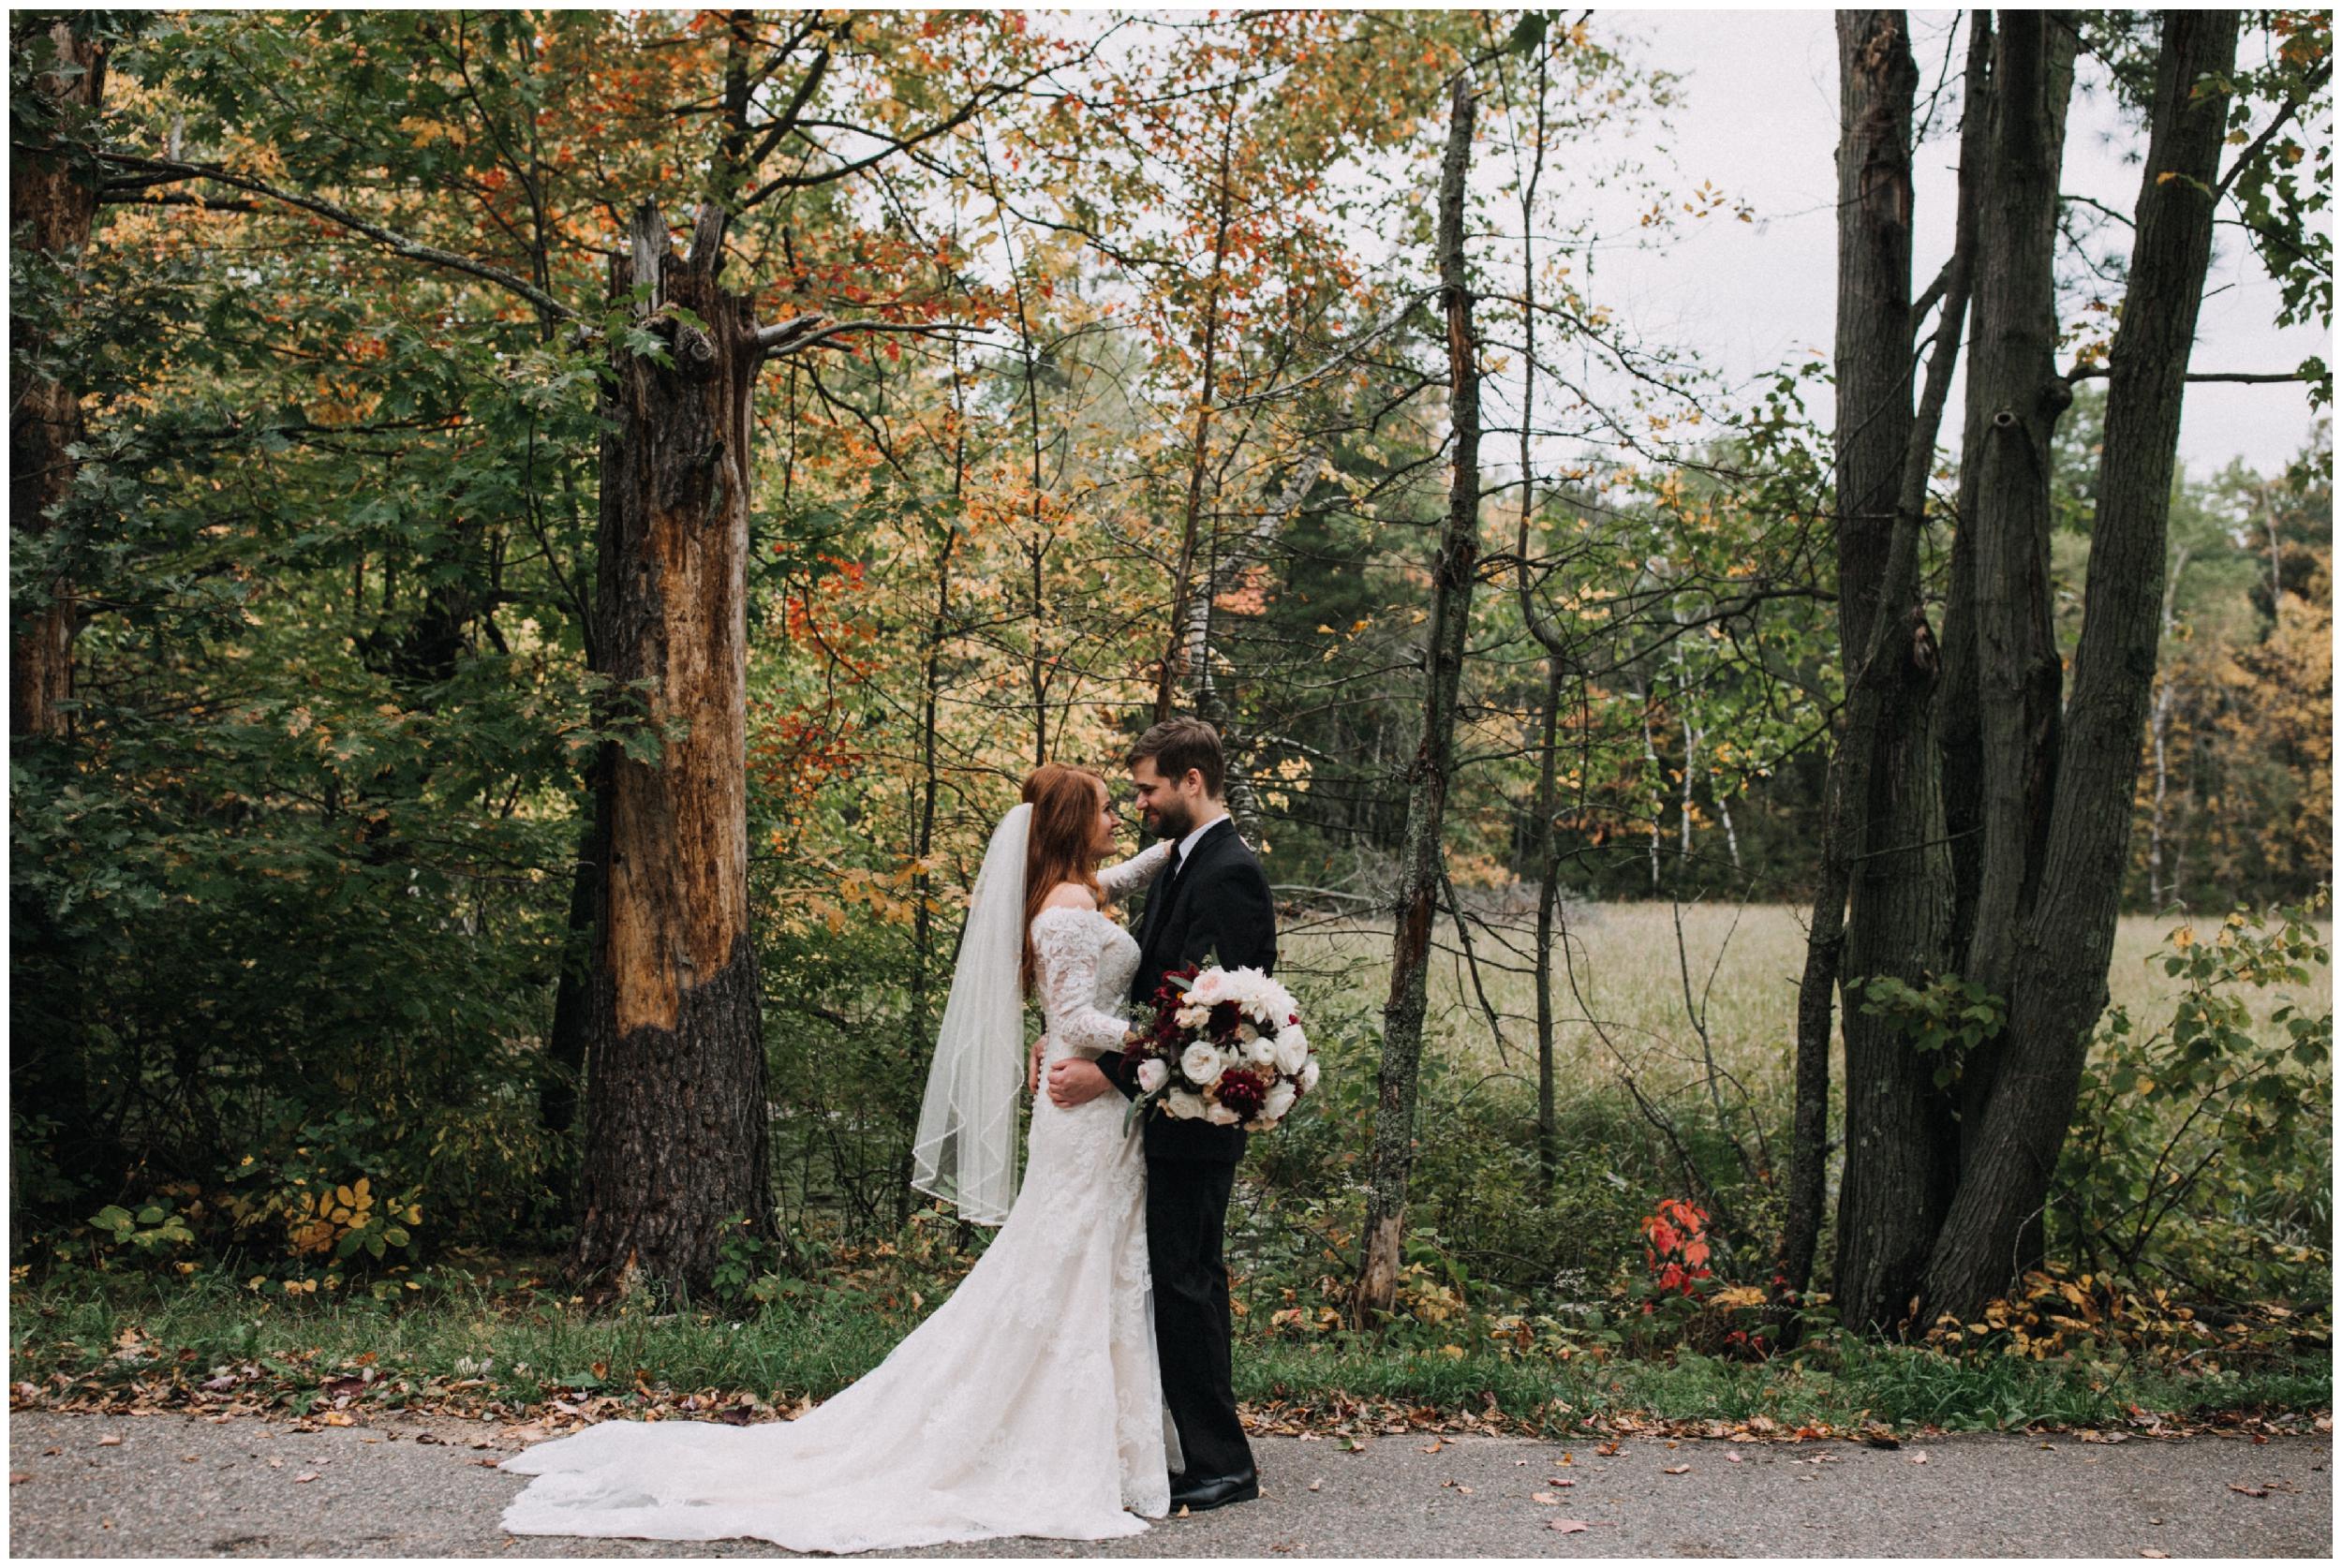 Minnesota fall wedding at the Quarterdeck Resort